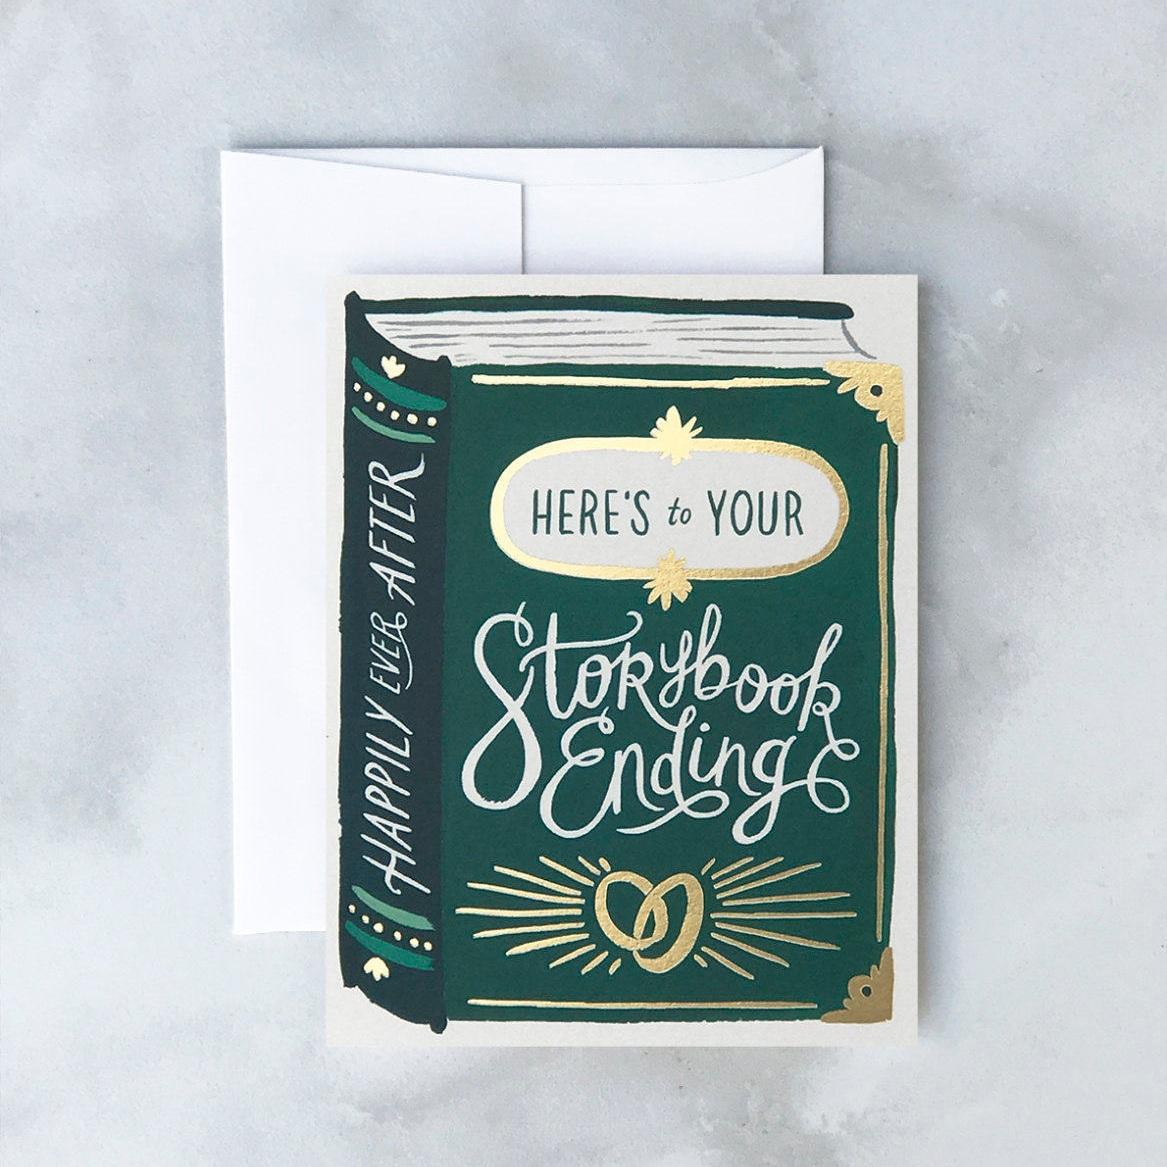 Storybook Ending Wedding Greeting Card by Idlewild Co.